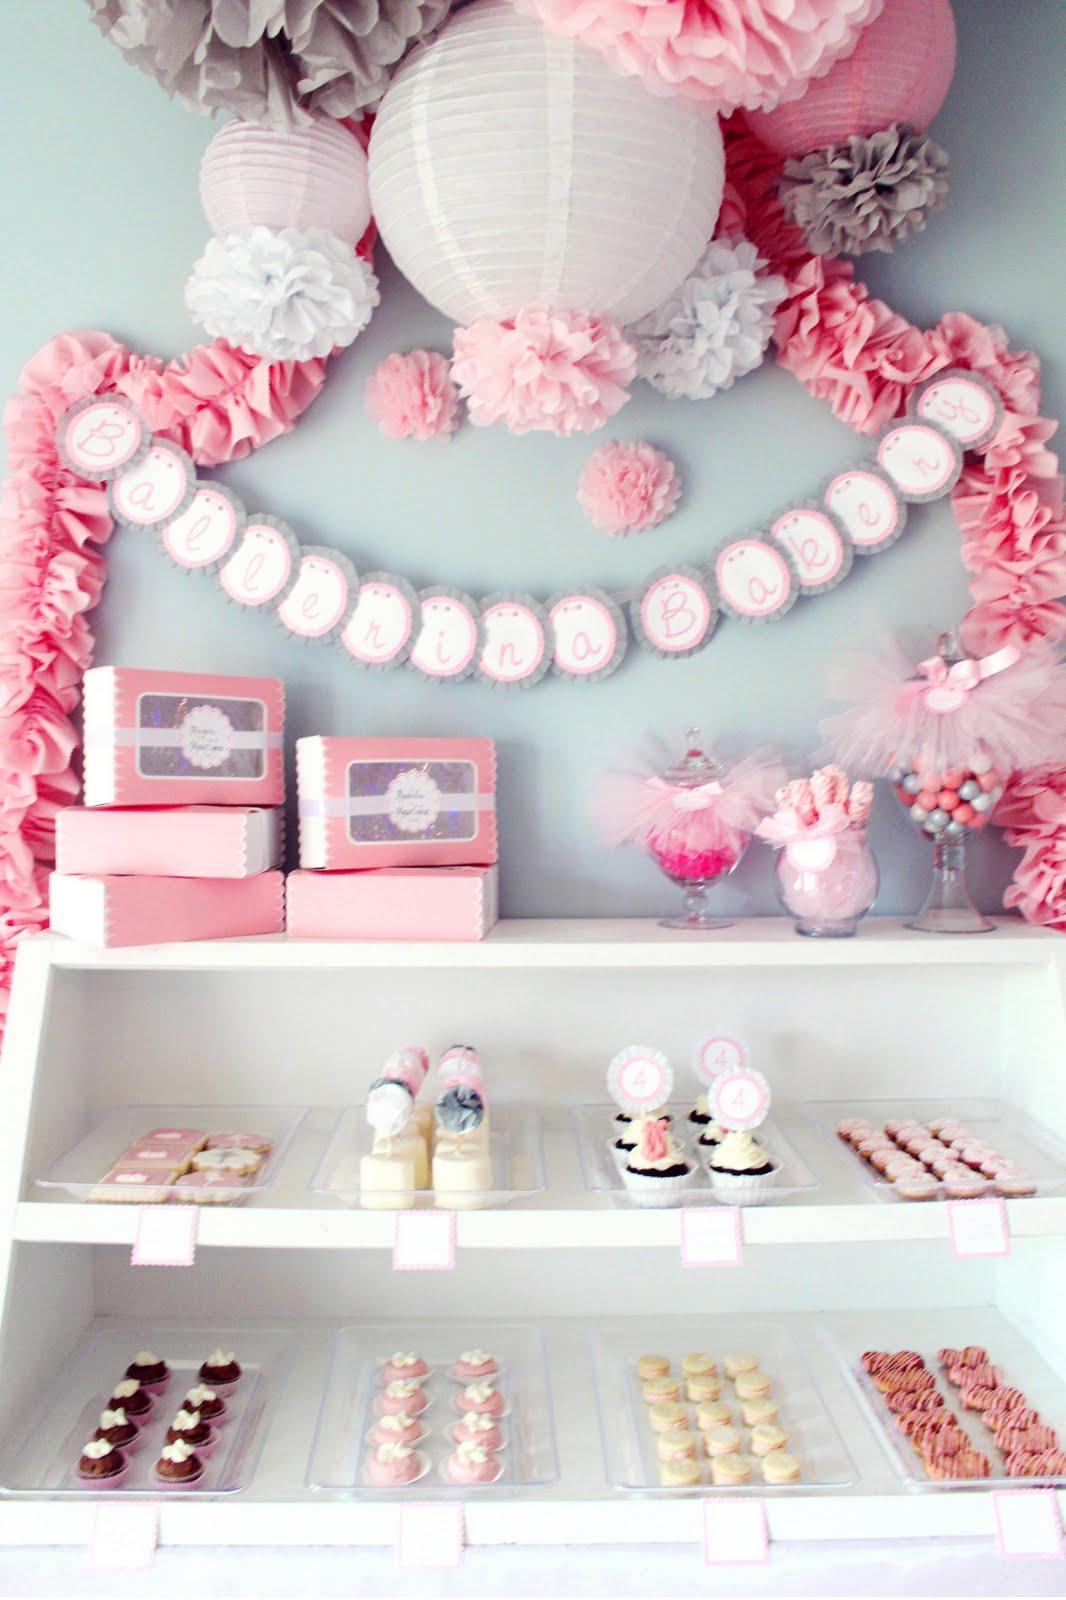 Icing Designs Ballerina Bakery Birthday Party Part 1